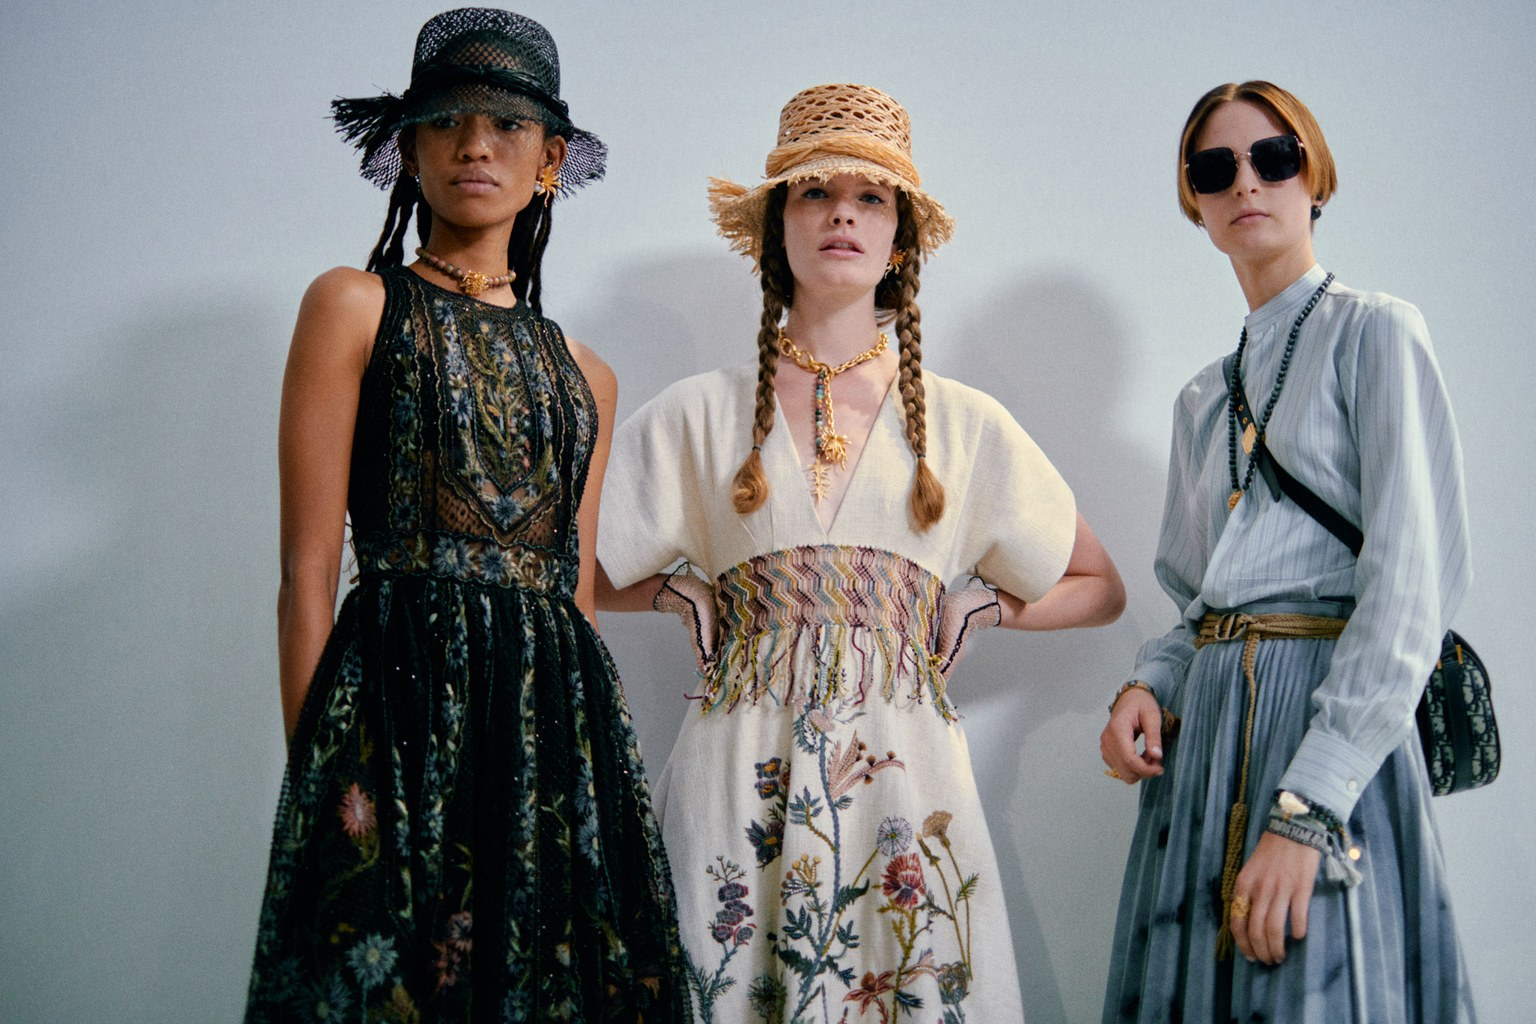 dior back - La magia della Paris Fashion Week - prima parte